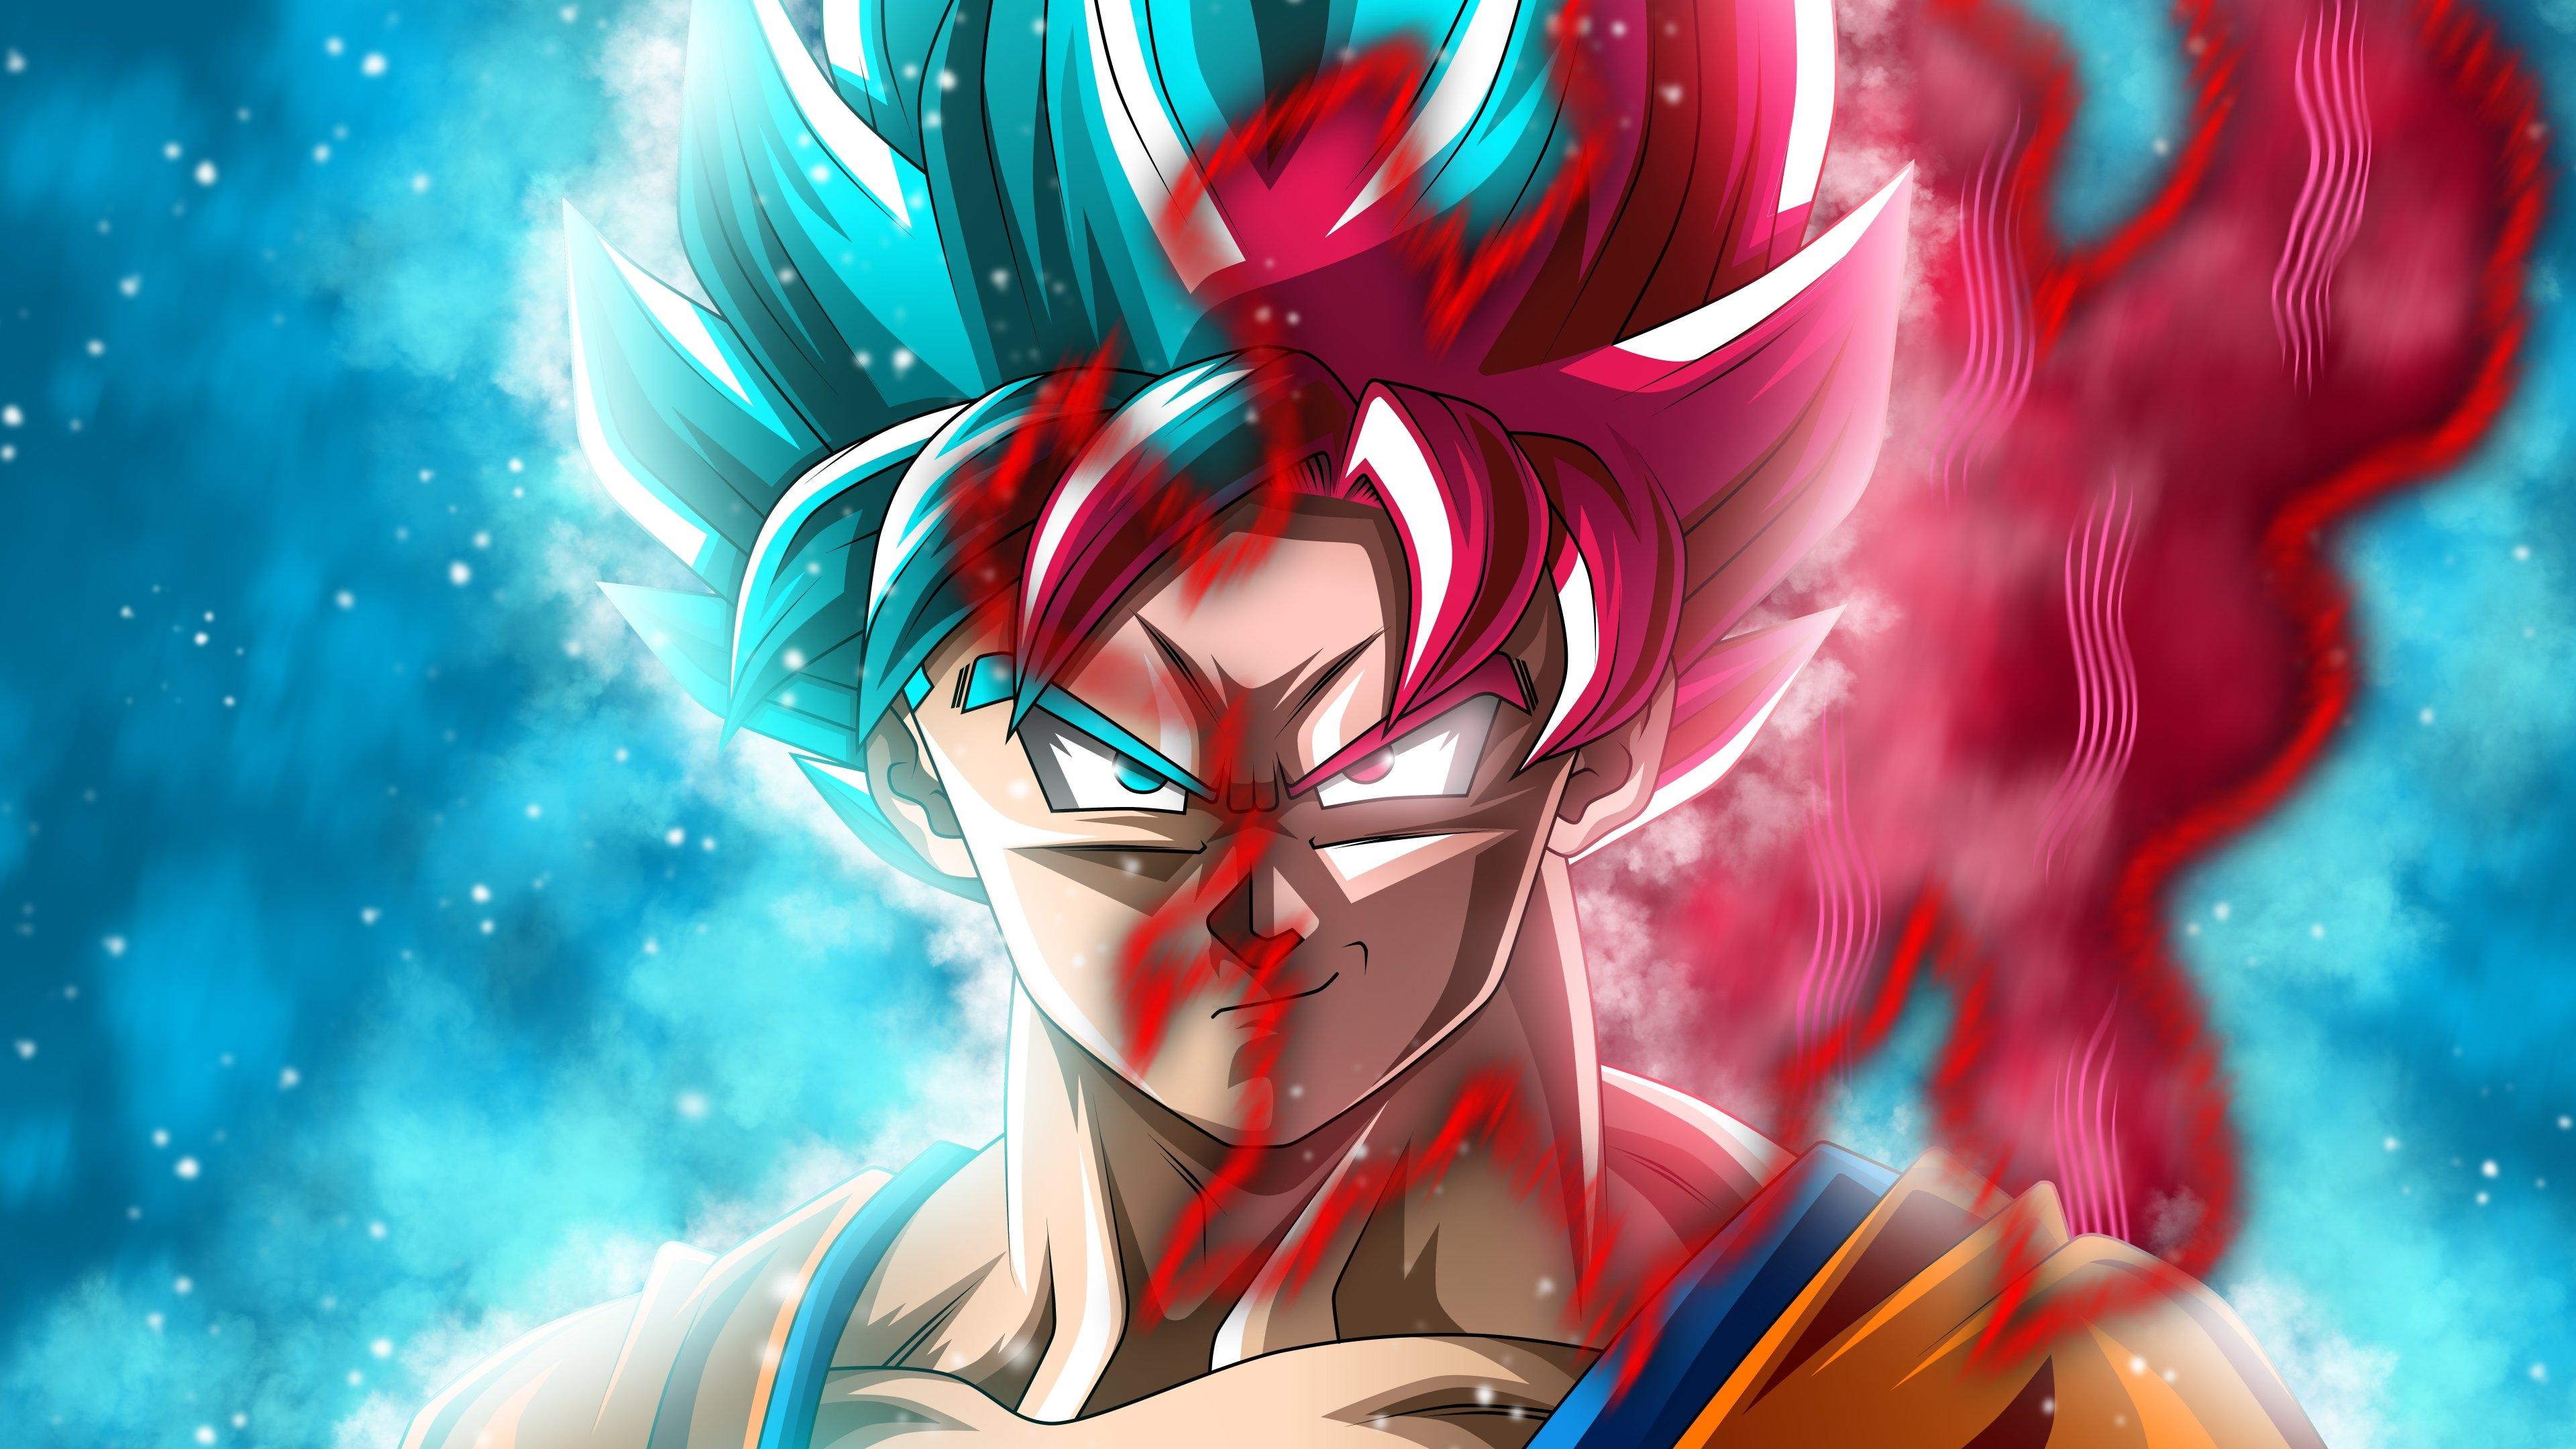 Goku Super Saiyan Blue And Black Goku Ssr Dragon Ball Super